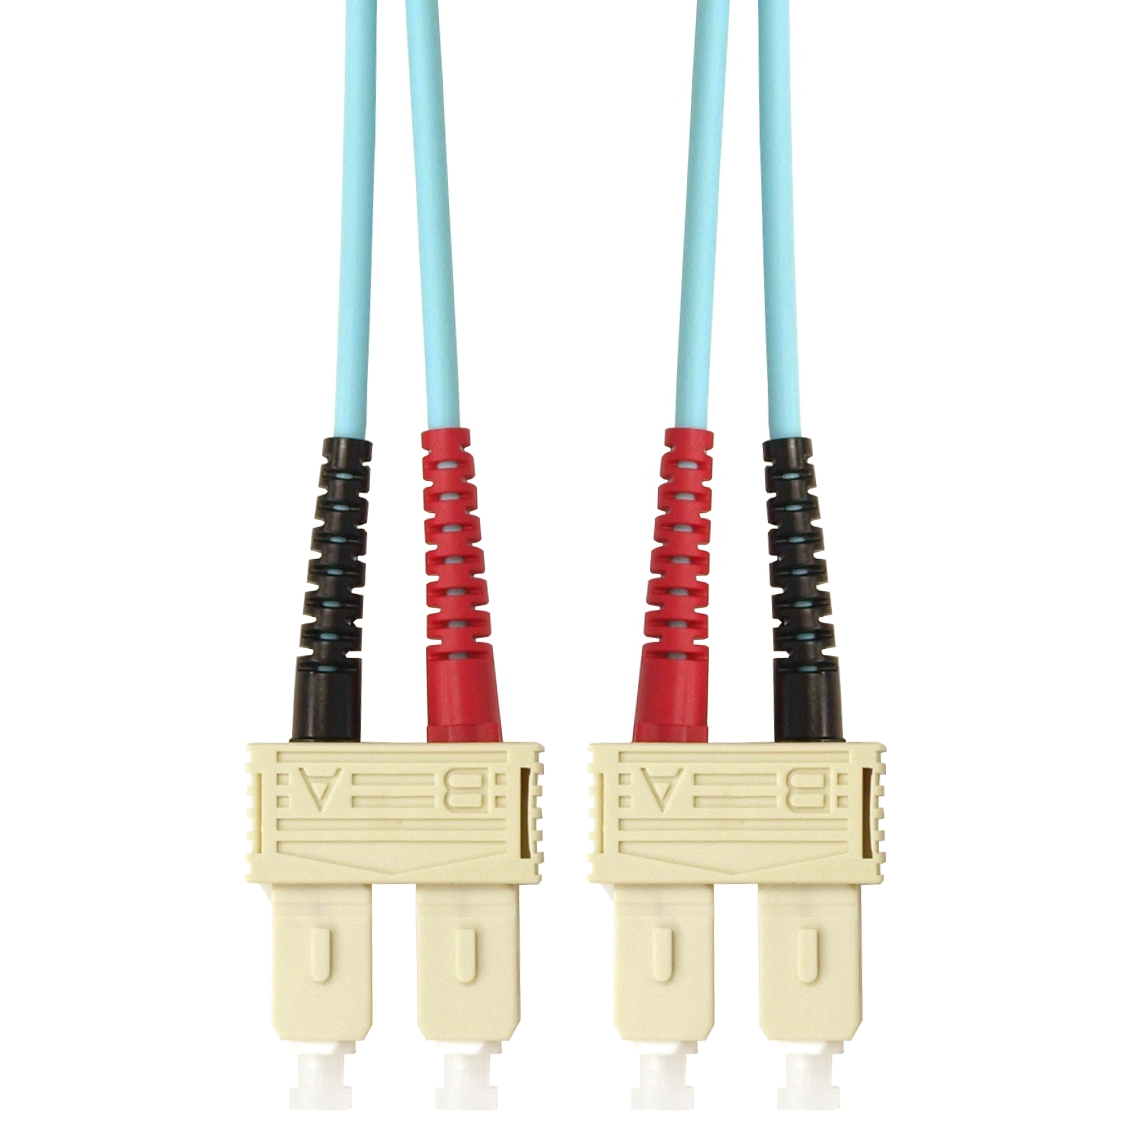 1 Stk LWL Patchkabel Duplex SC/SC,50/125µm OM3,LS0H-3,aqua, 2.0m HLP23CC02F